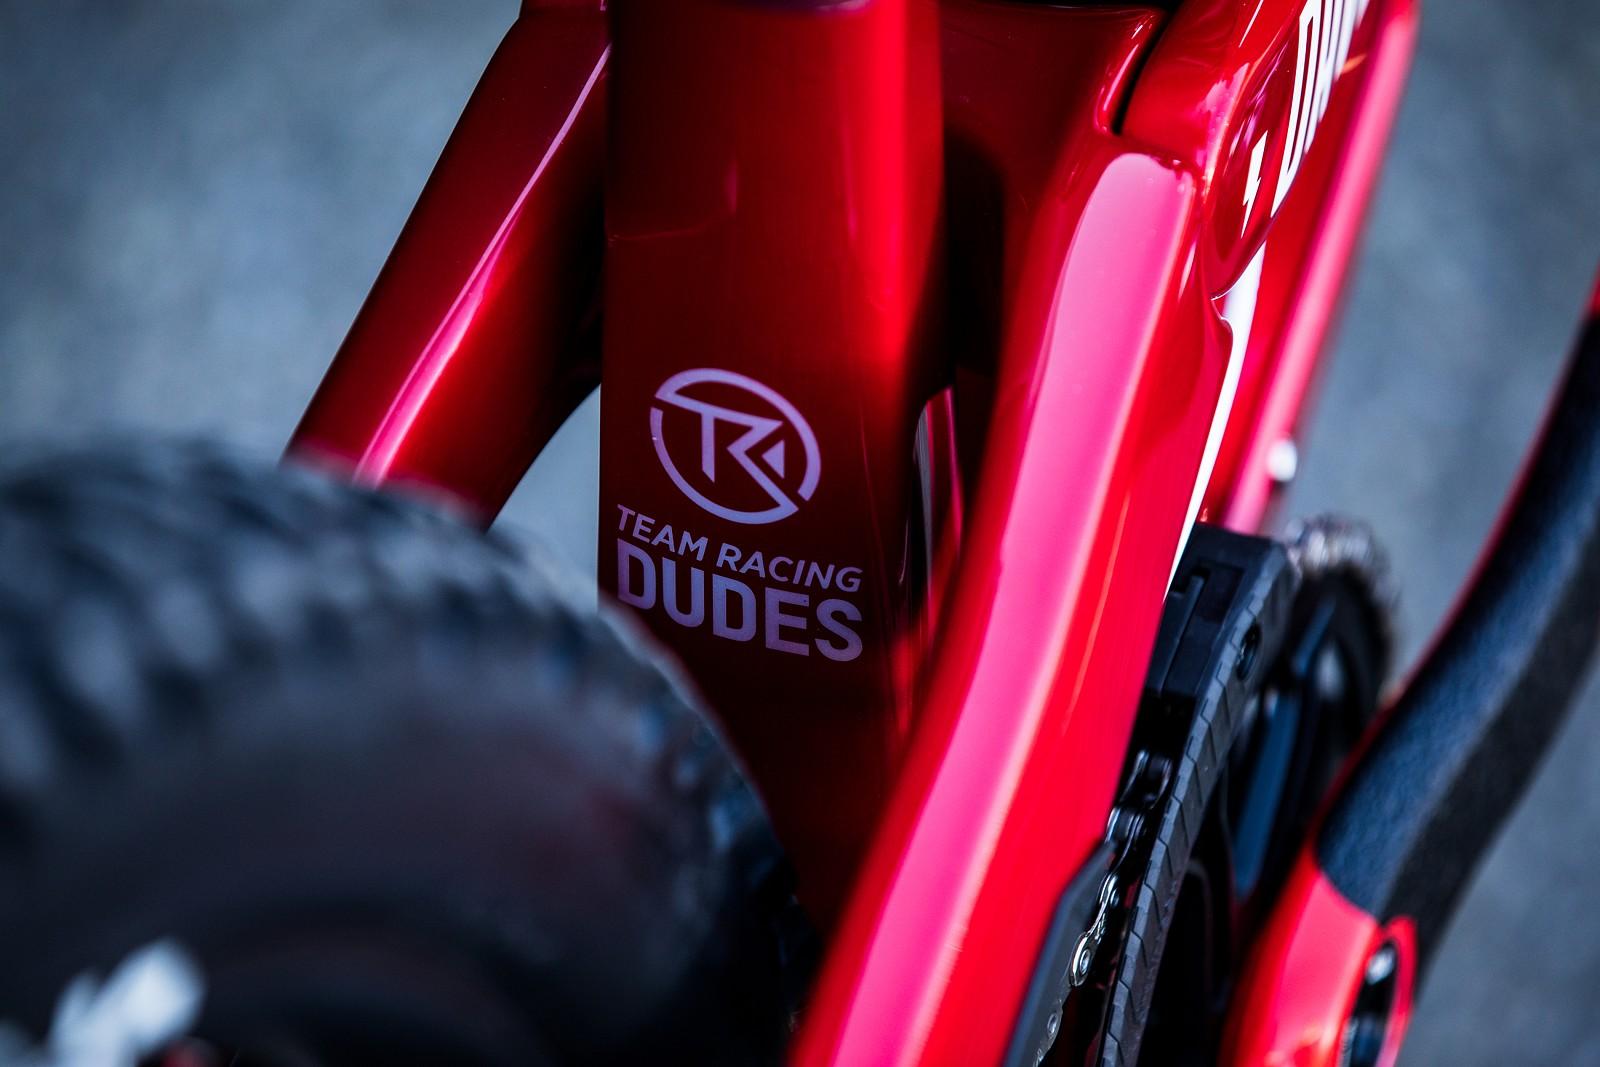 David Trummer's YT TUES at 2019 Worlds MSA - David Trummer's YT TUES at 2019 Worlds MSA - Mountain Biking Pictures - Vital MTB